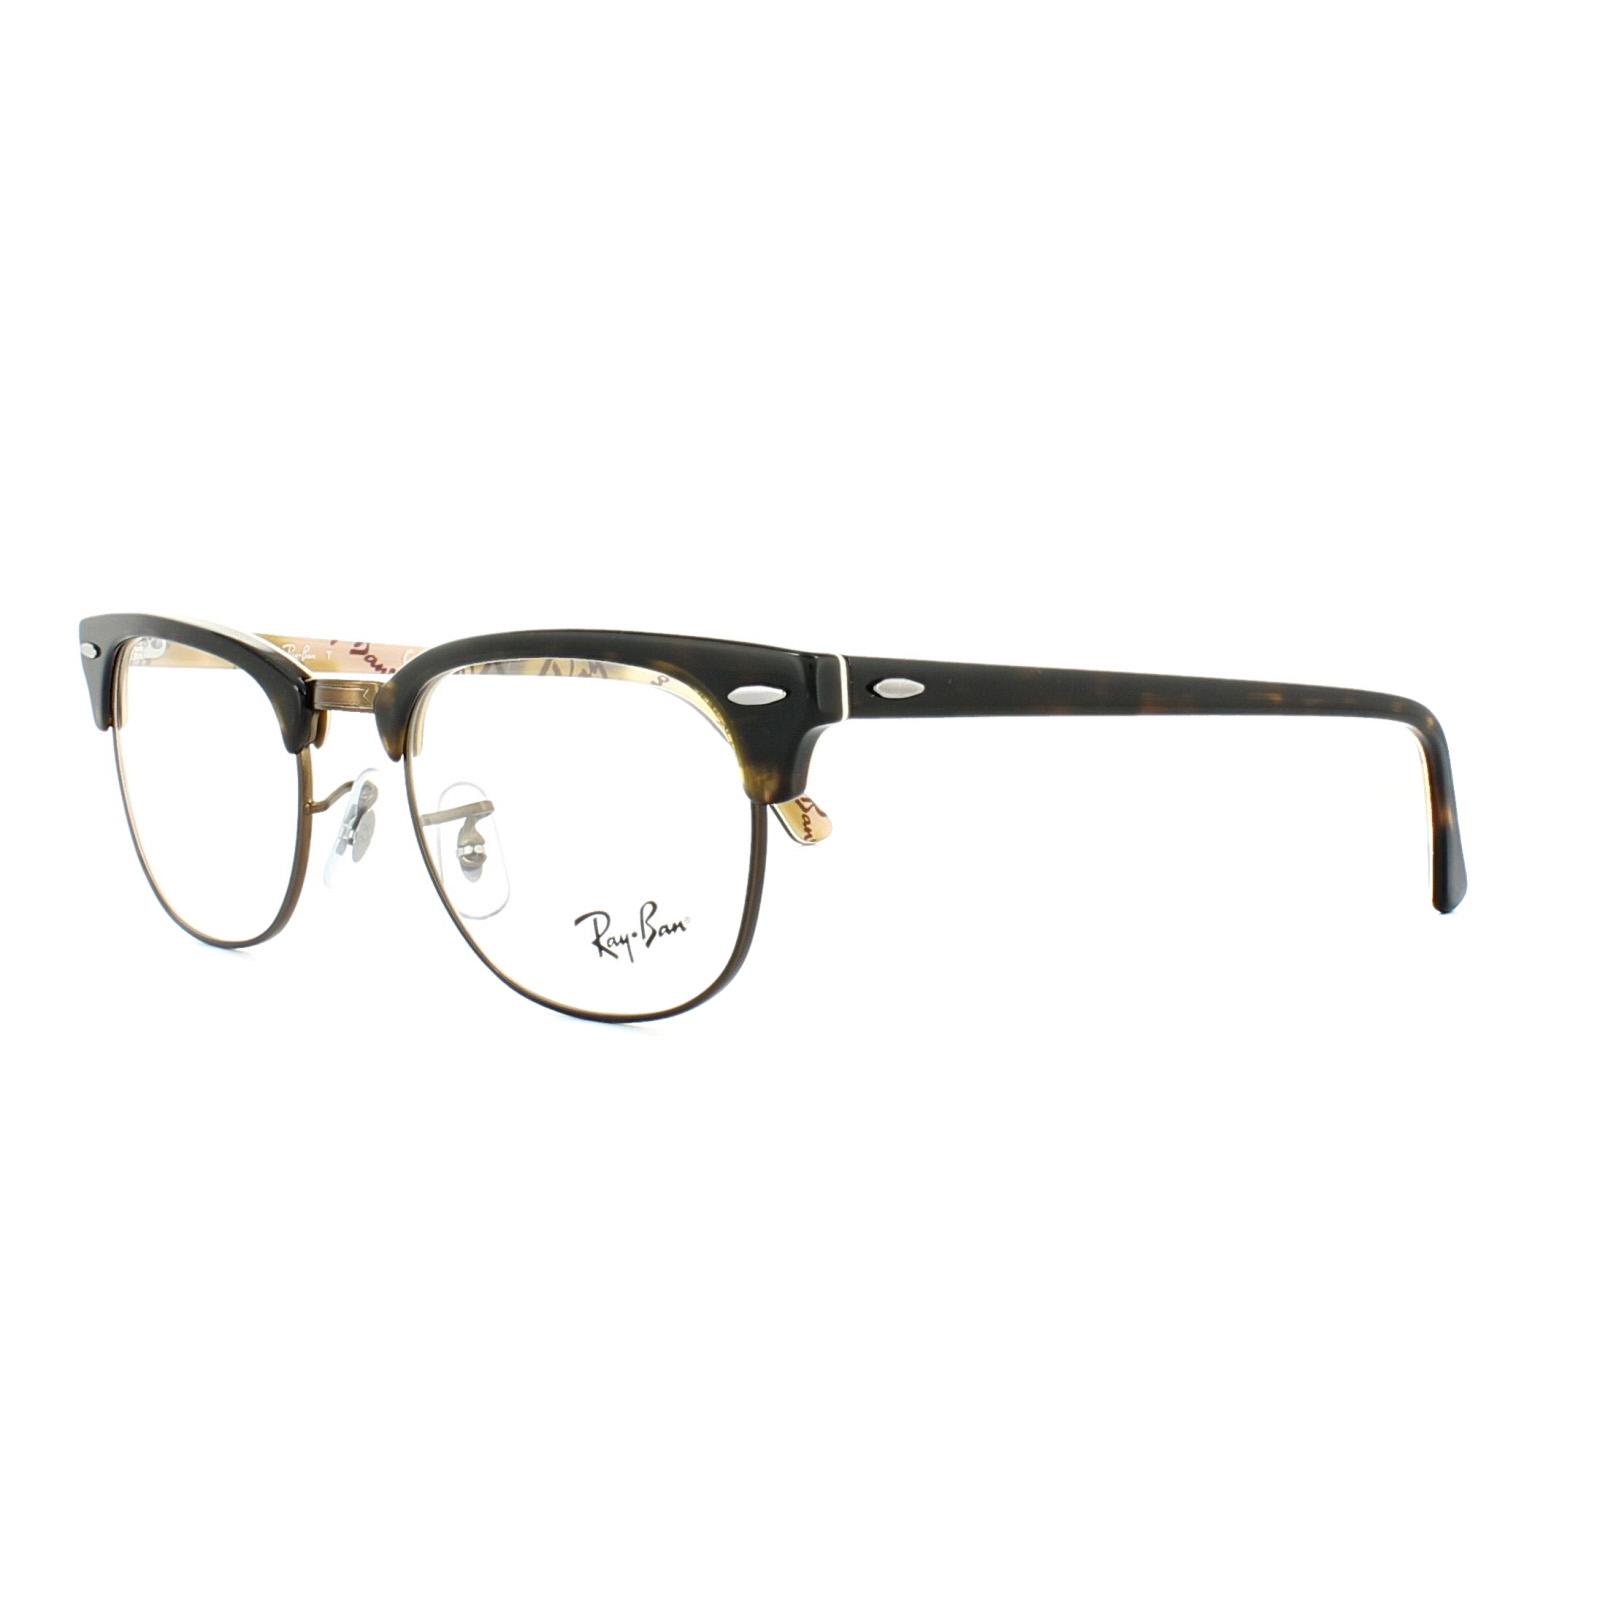 Ray-Ban Glasses Frames 5154 Clubmaster 5650 Havana Texture ...